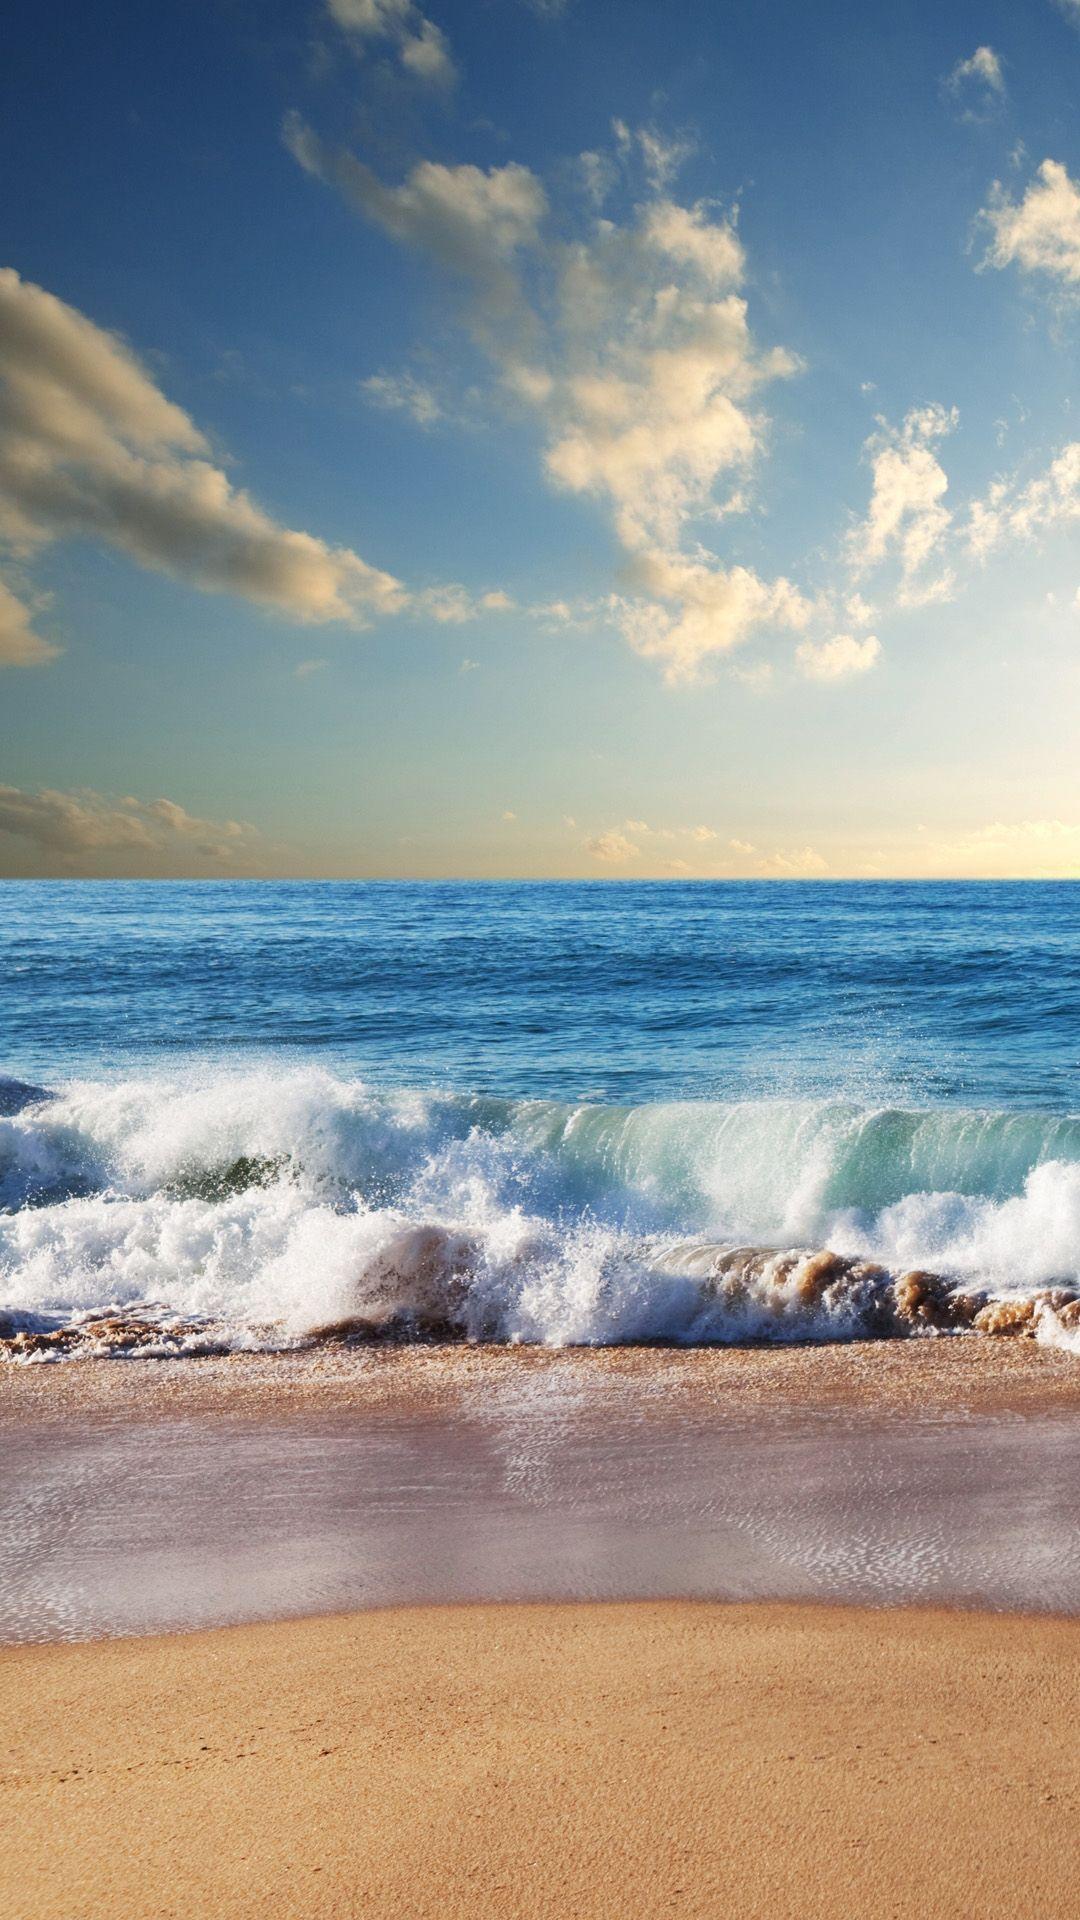 California Beach Iphone Wallpapers Top Free California